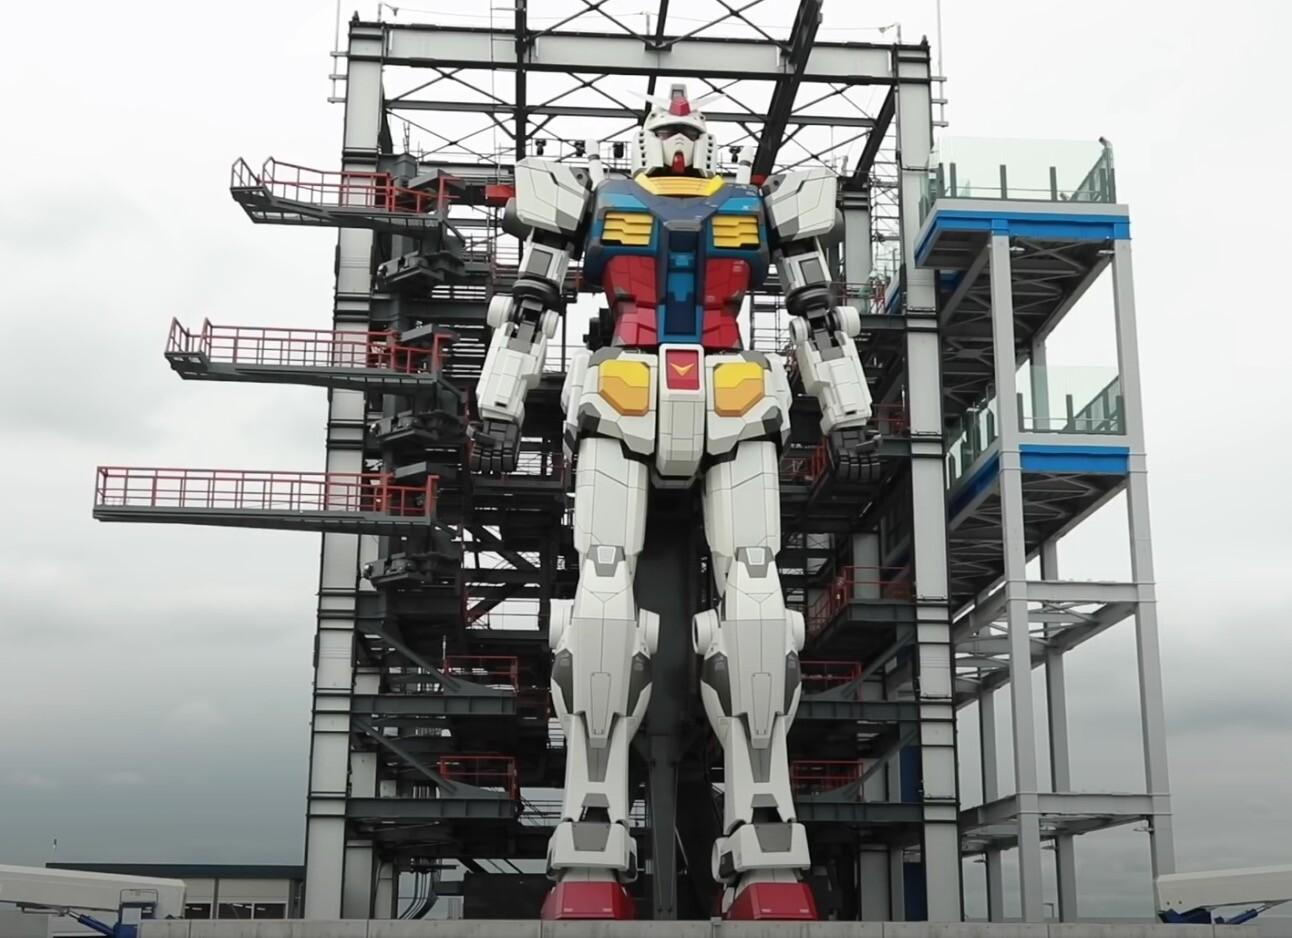 Esta réplica japonesa de un robot Gundam a escala real puede moverse